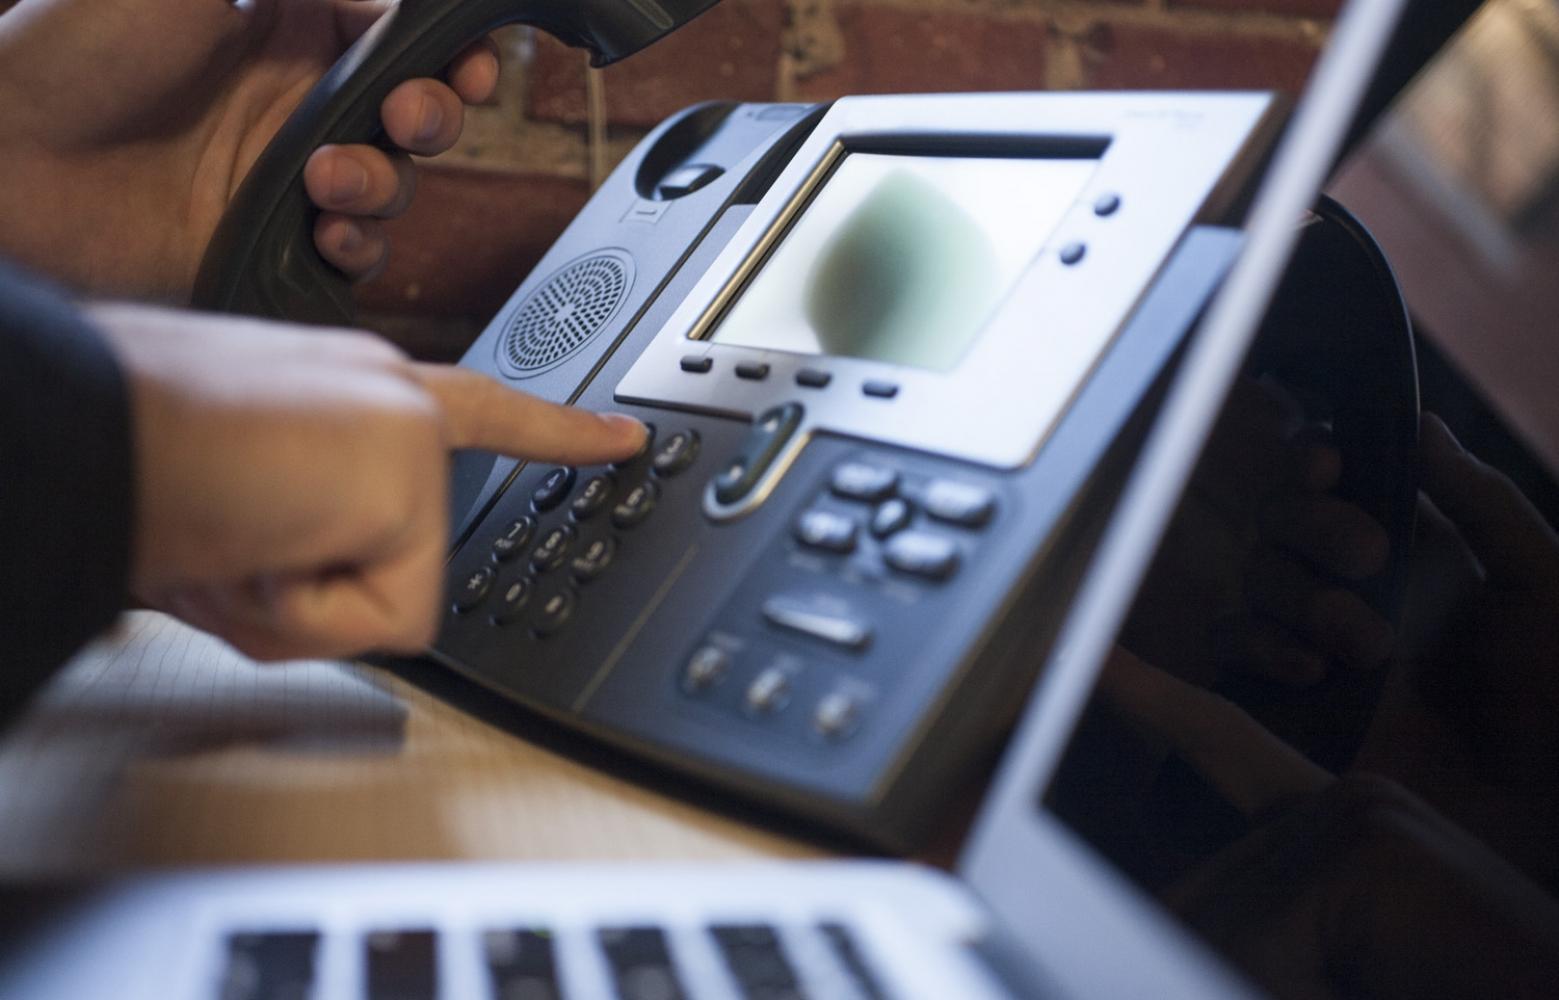 dialing-phone-3